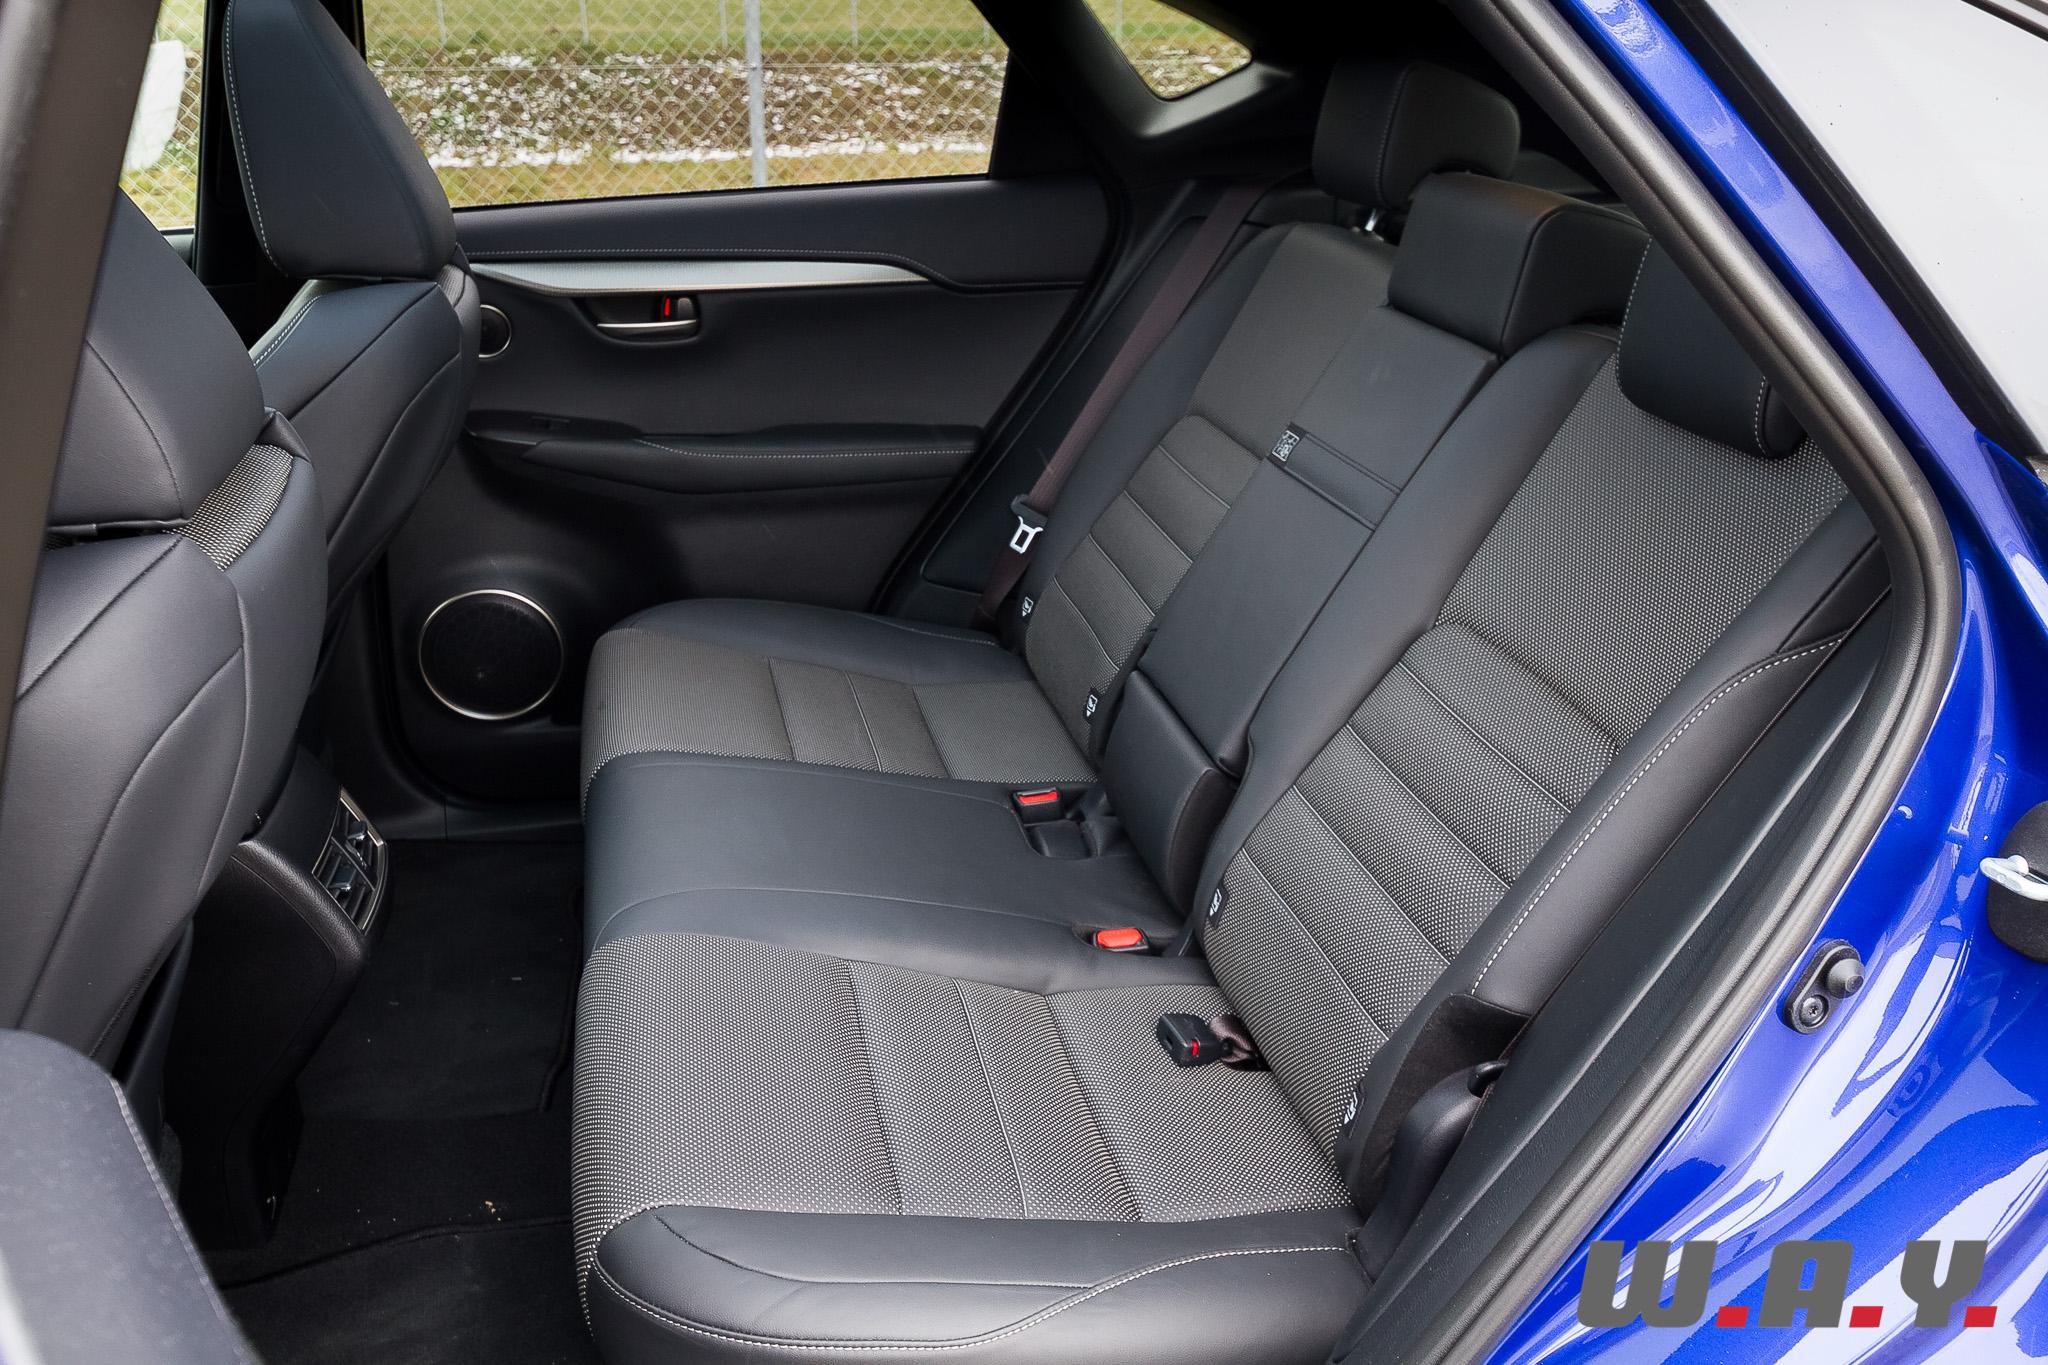 LexusNX300h 21